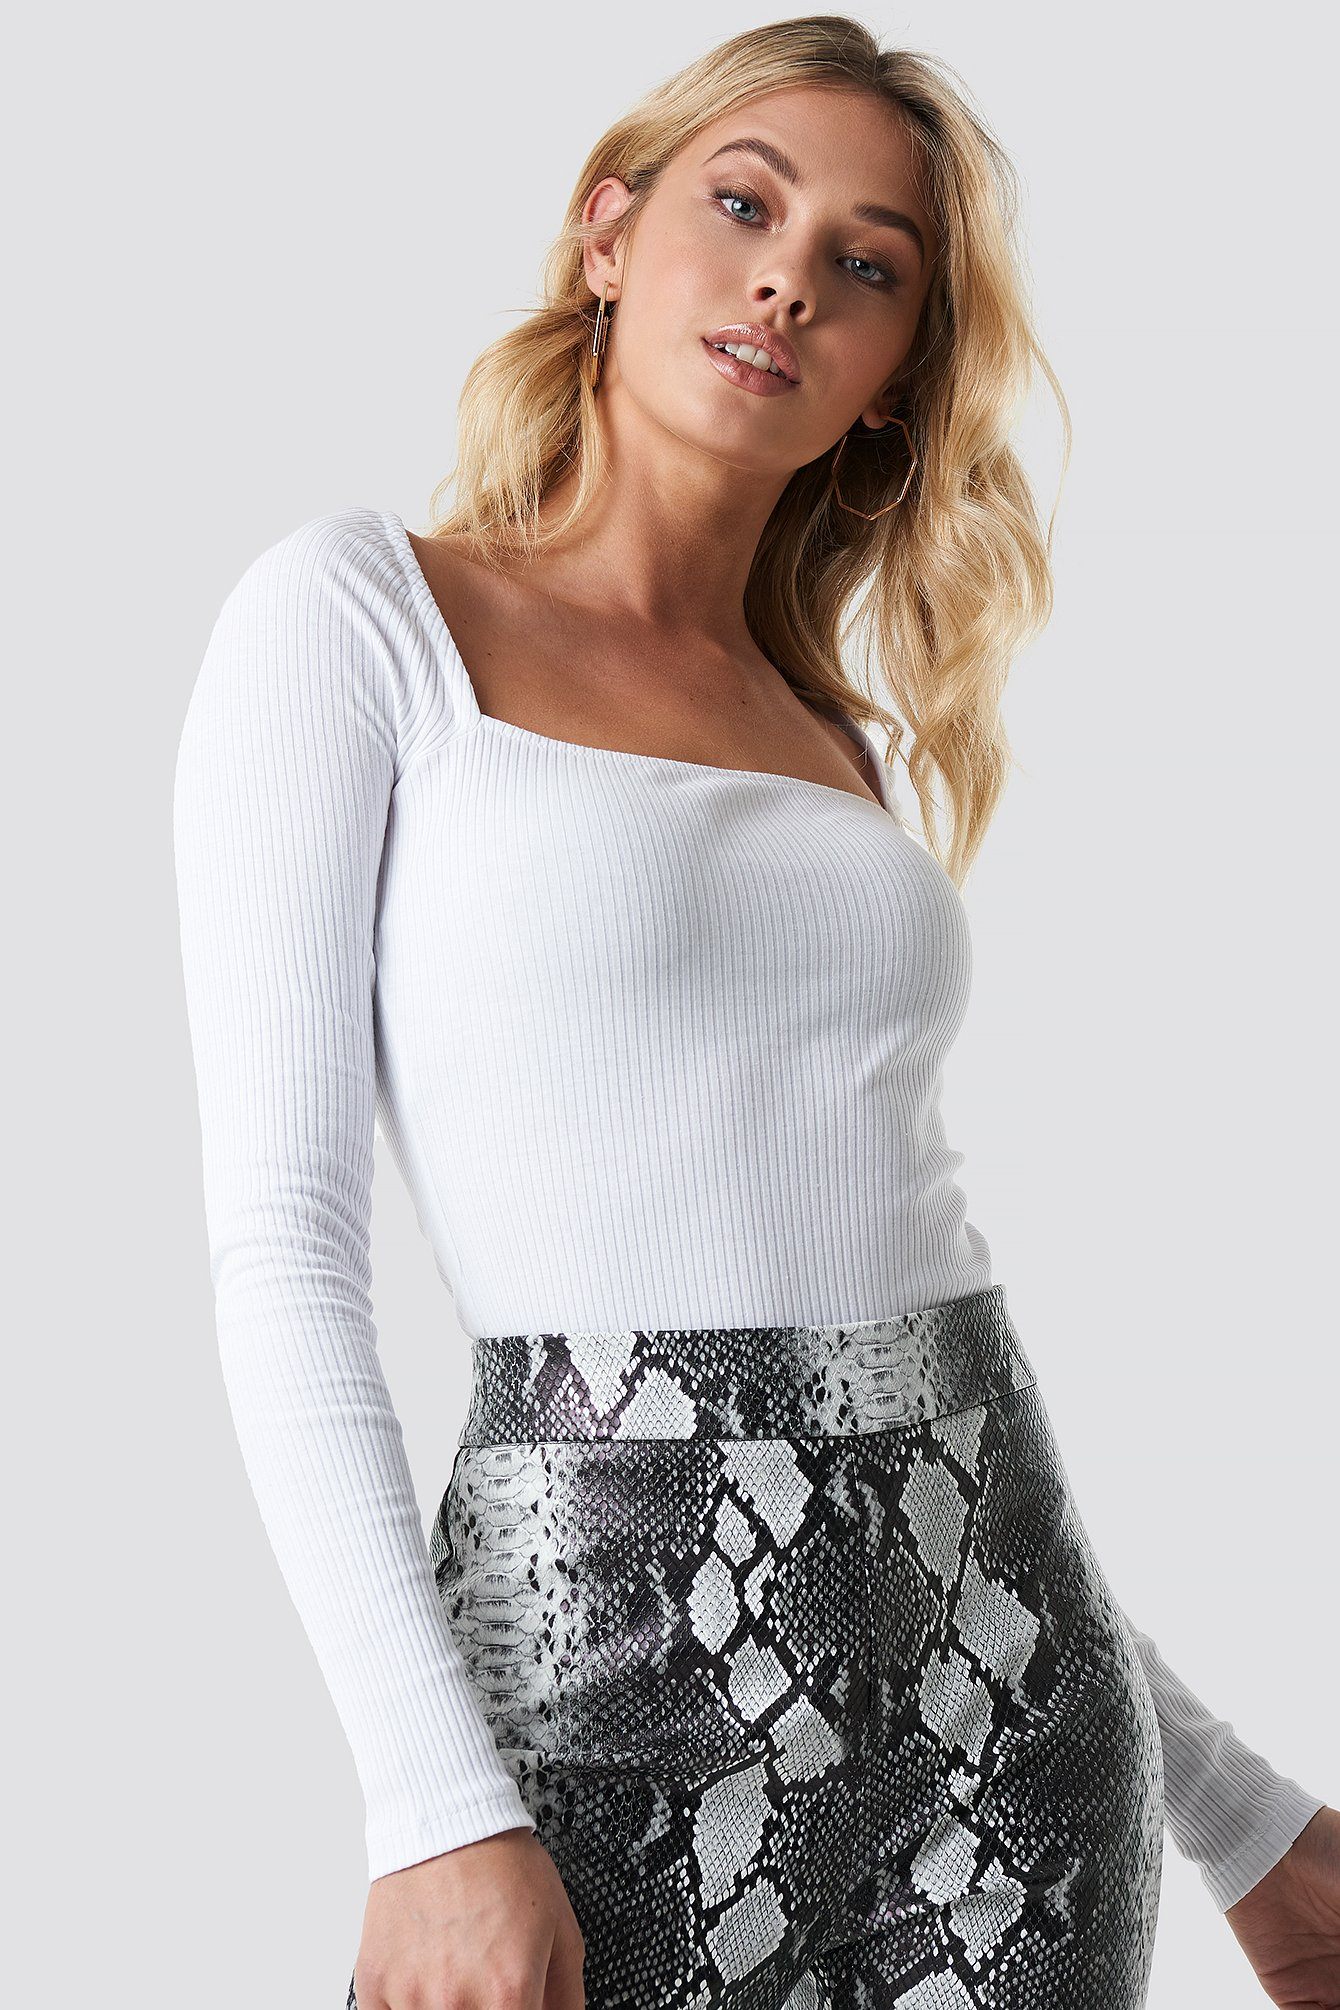 ANNA NOOSHIN X NA-KD Square Shape Ribbed Top - White